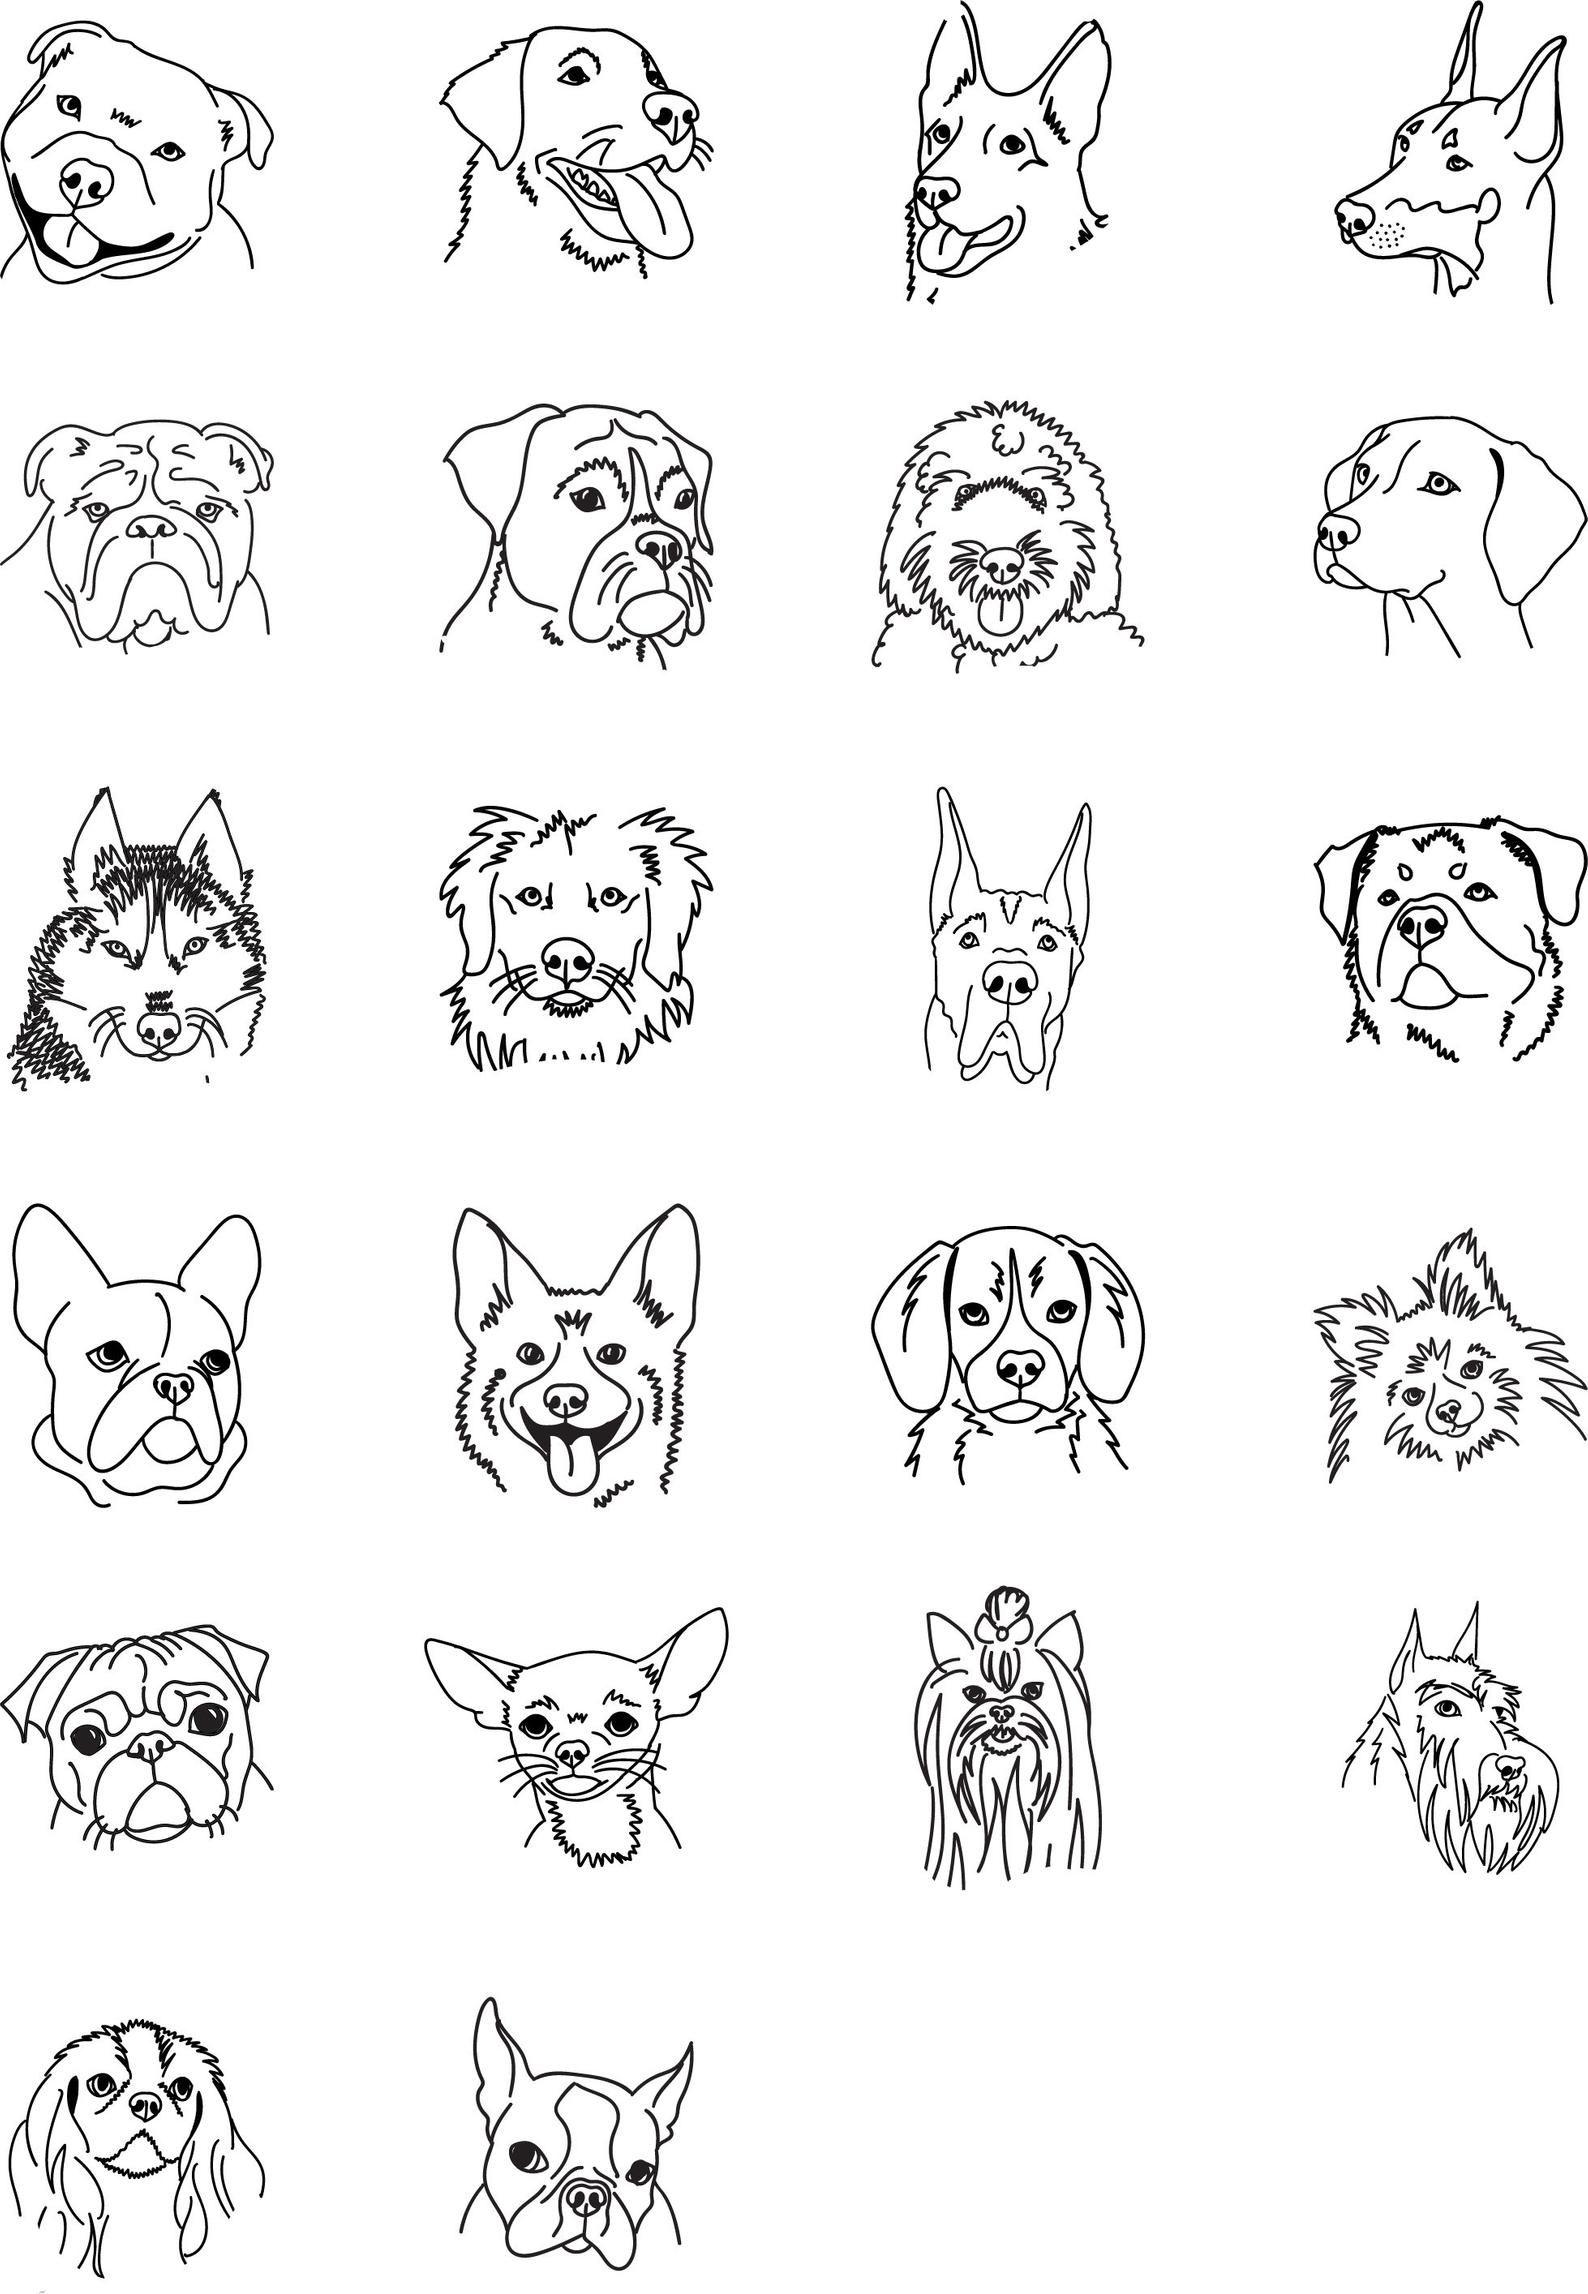 Labrador Dog Address Stamp Personalized Dog Stamp Personalized